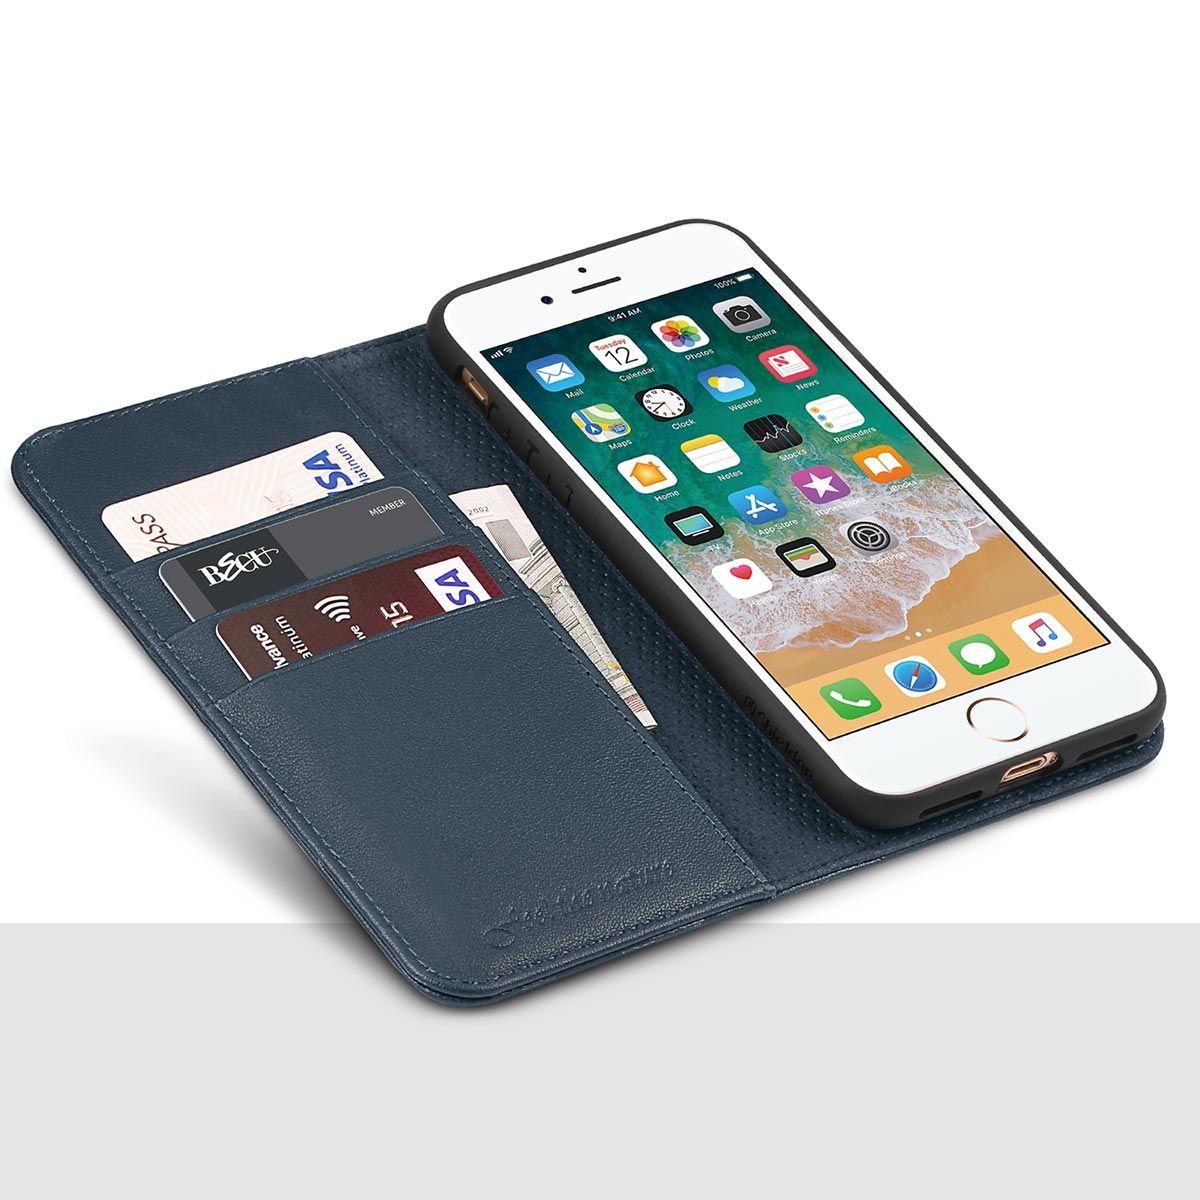 hot sale online 8cdf4 e258a SHIELDON iPhone 8 Plus Wallet Case, iPhone 7 Plus Wallet Case - Genuine  Leather Cover, Kickstand, Flip Cover